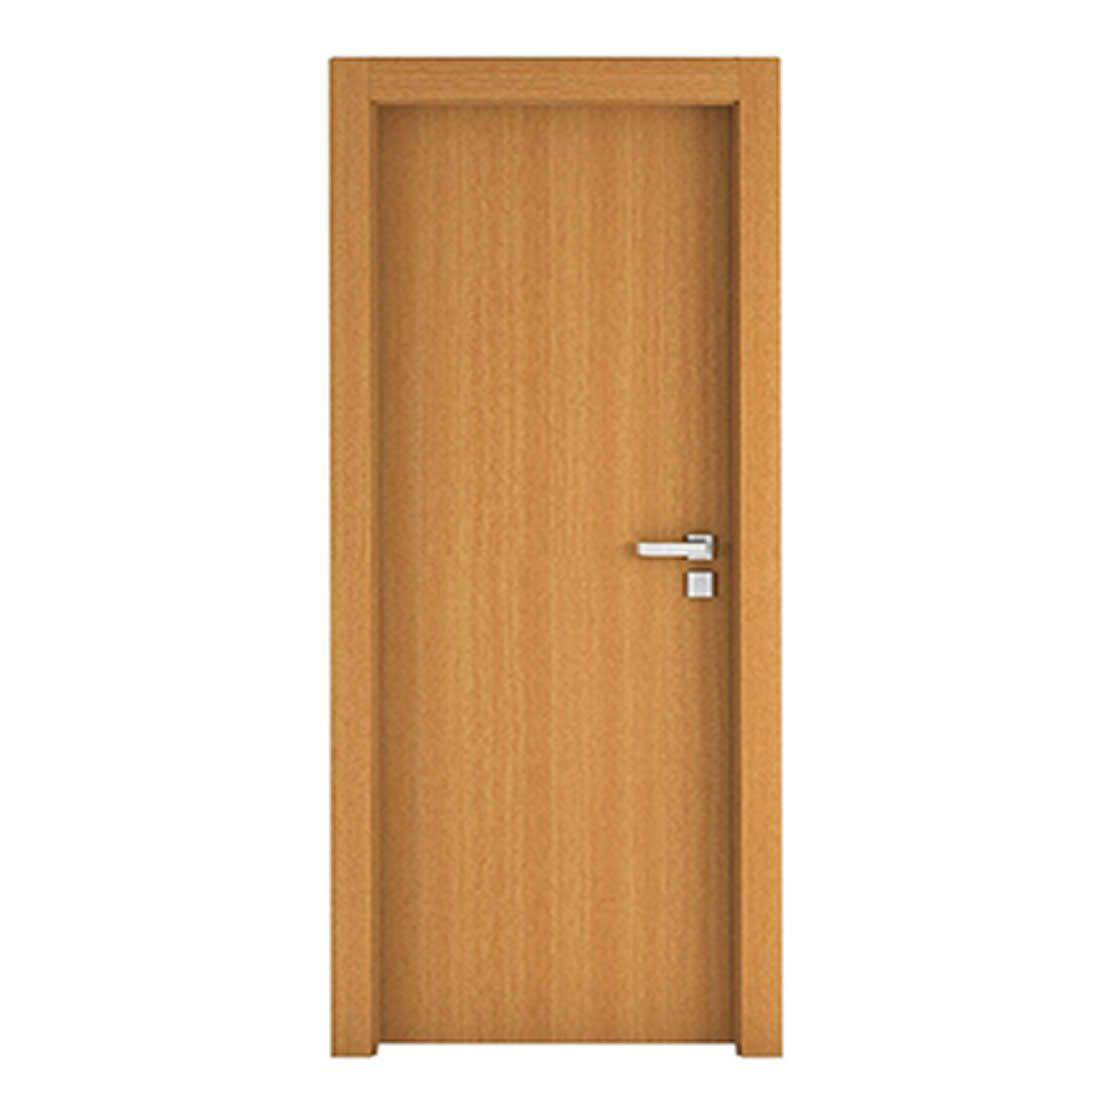 Kit Porta Concrem Wood 2,10 x 0,70 x 3,5 cm Esquerda Currupixá